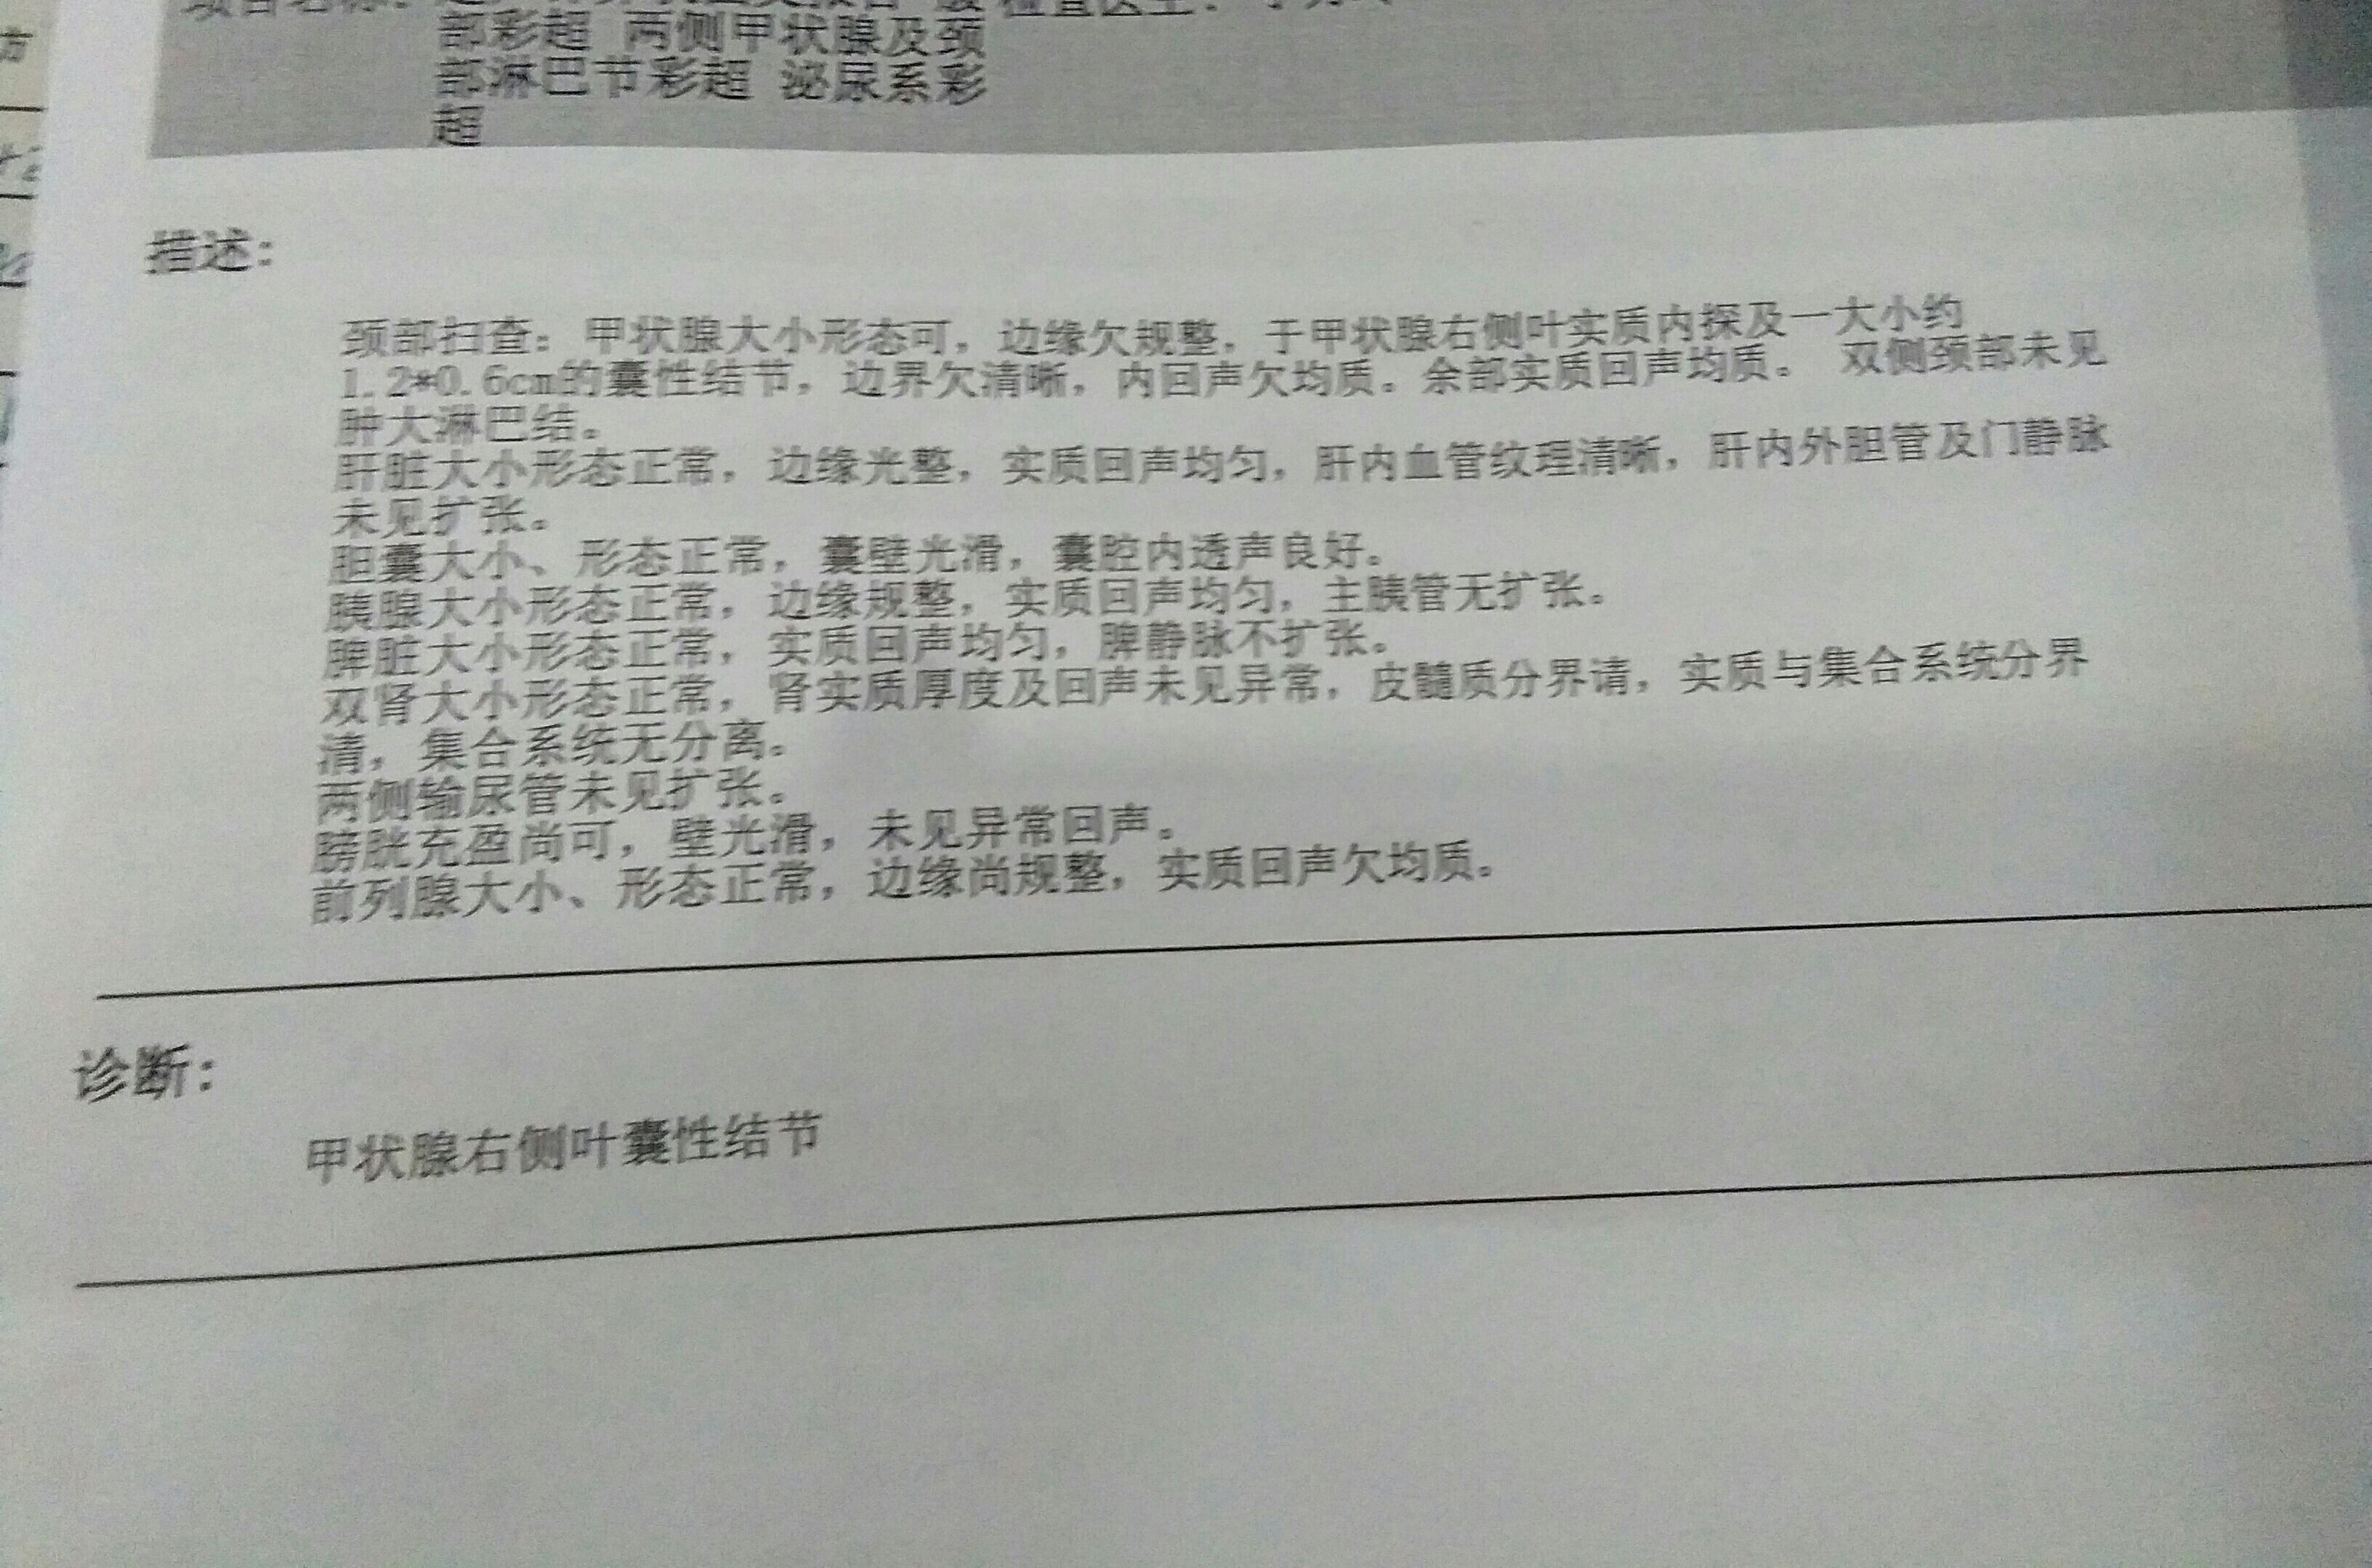 IMG_20180110_222713.JPG